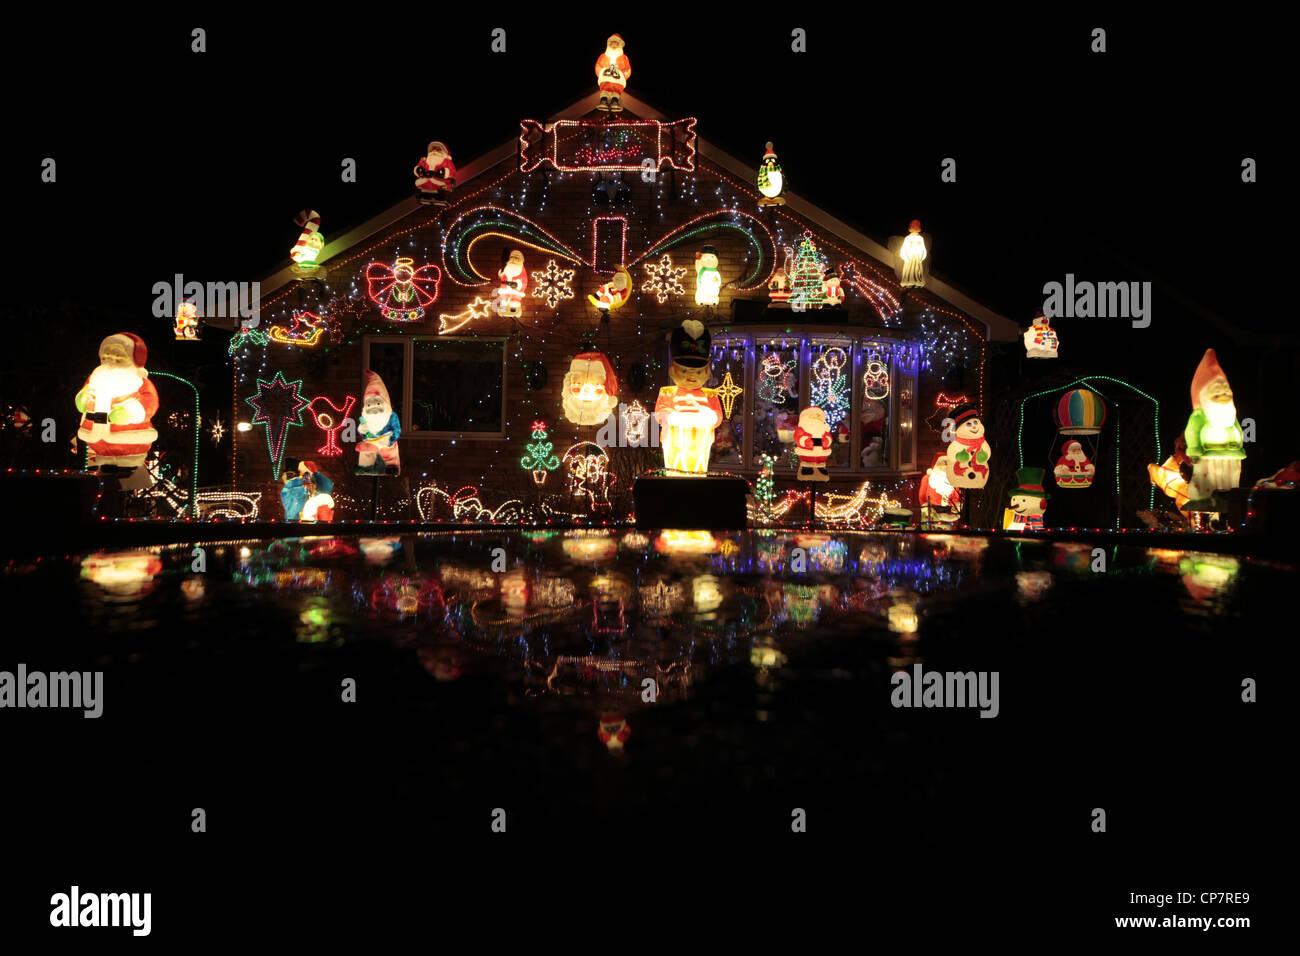 CHRISTMAS LIGHTS ON BUNGALOW RILLINGTON NORTH YORKSHIRE 30 December 2011 - Stock Image